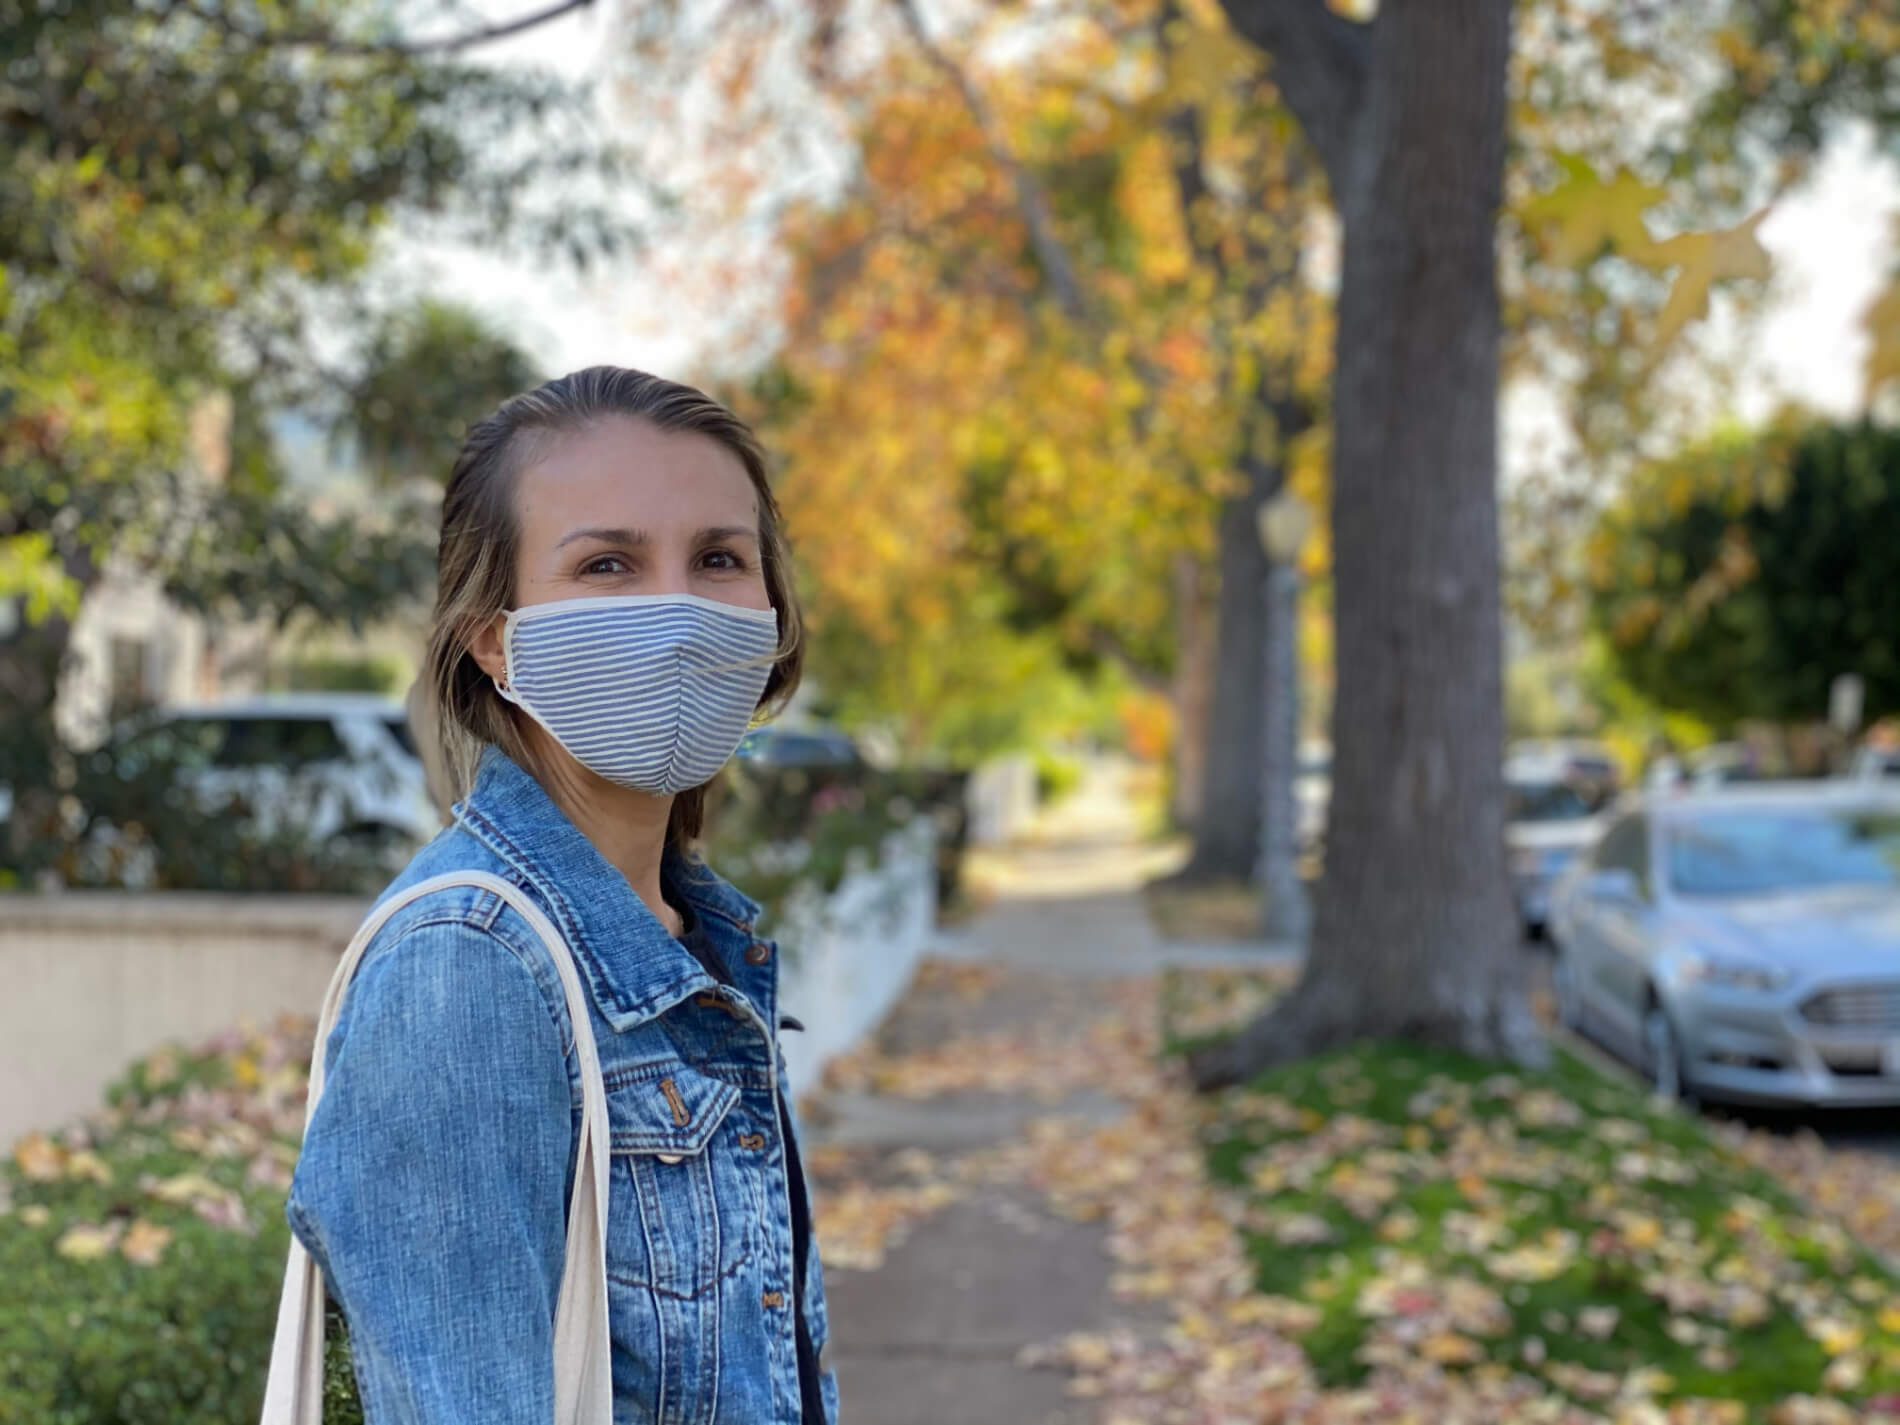 Marika Price wearing a face mask posing on a sidewalk during an autumn walk in quarantine